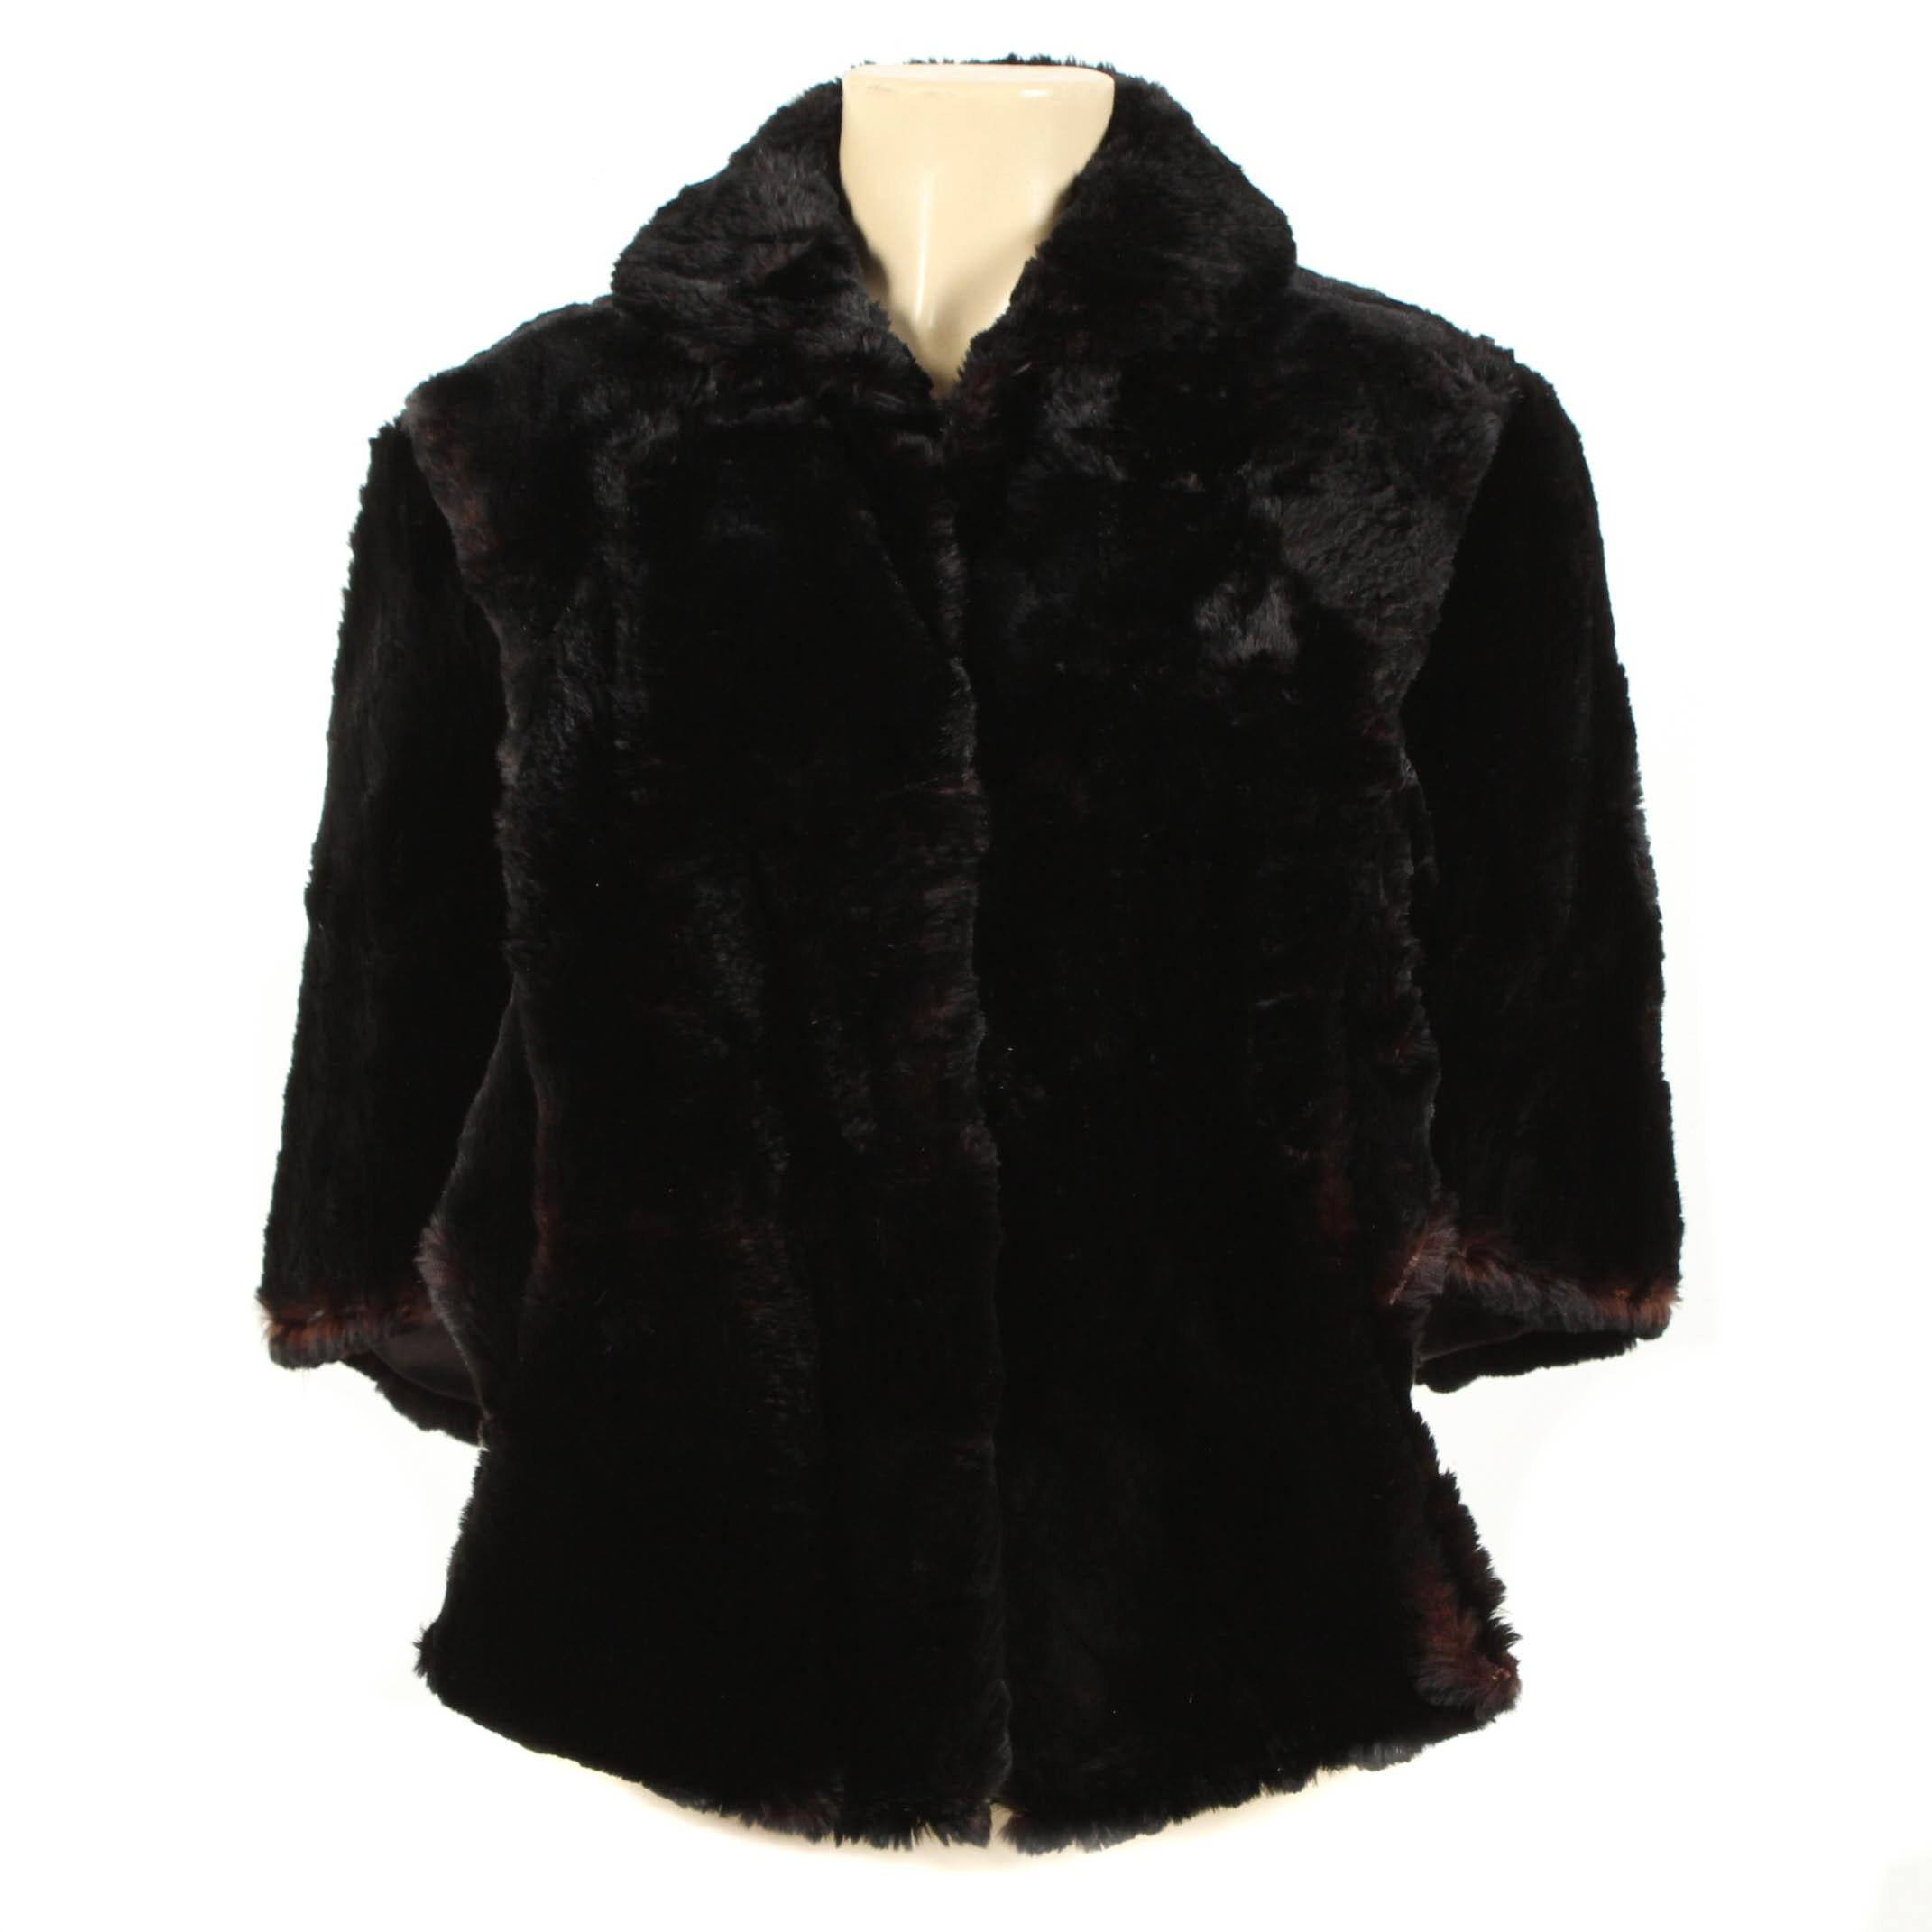 Vintage Sheared Beaver Fur Stole